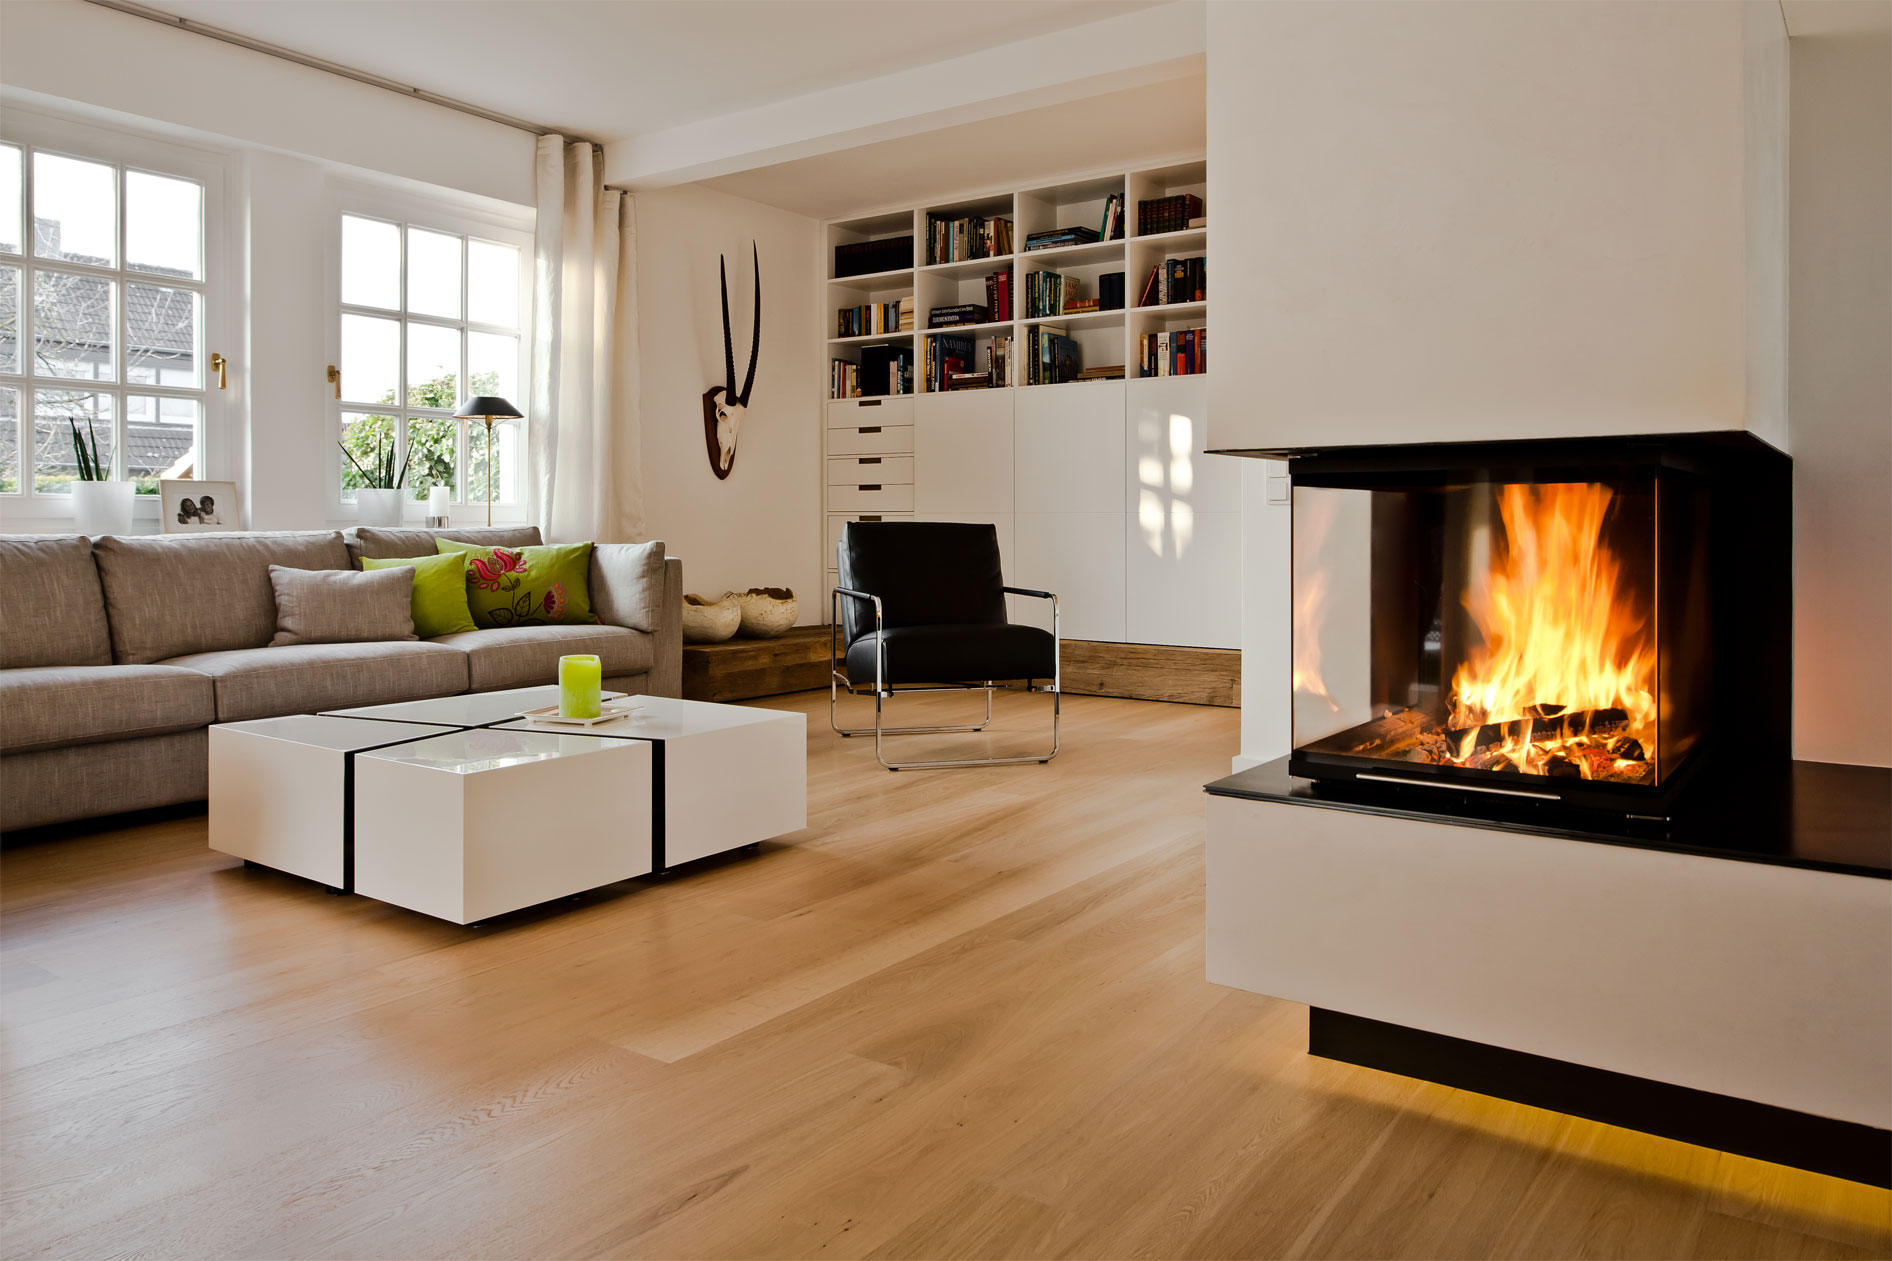 umbau wohnen p6 raumfabrik. Black Bedroom Furniture Sets. Home Design Ideas